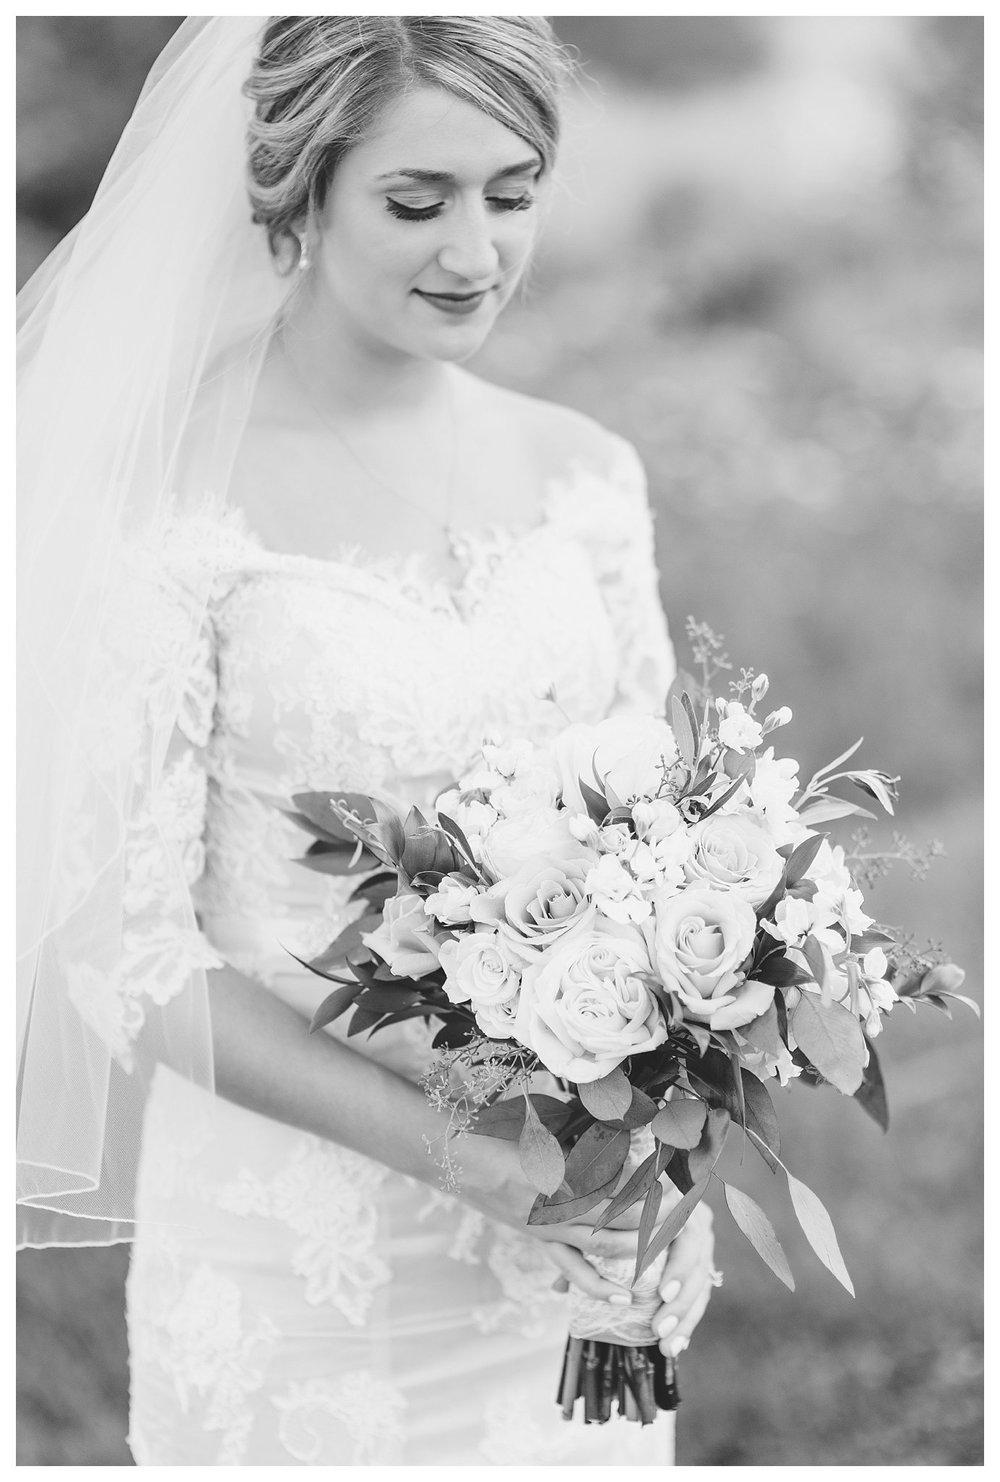 tower-park-mess-hall-everleigh-photography-northern-kentucky-wedding-photographer-16